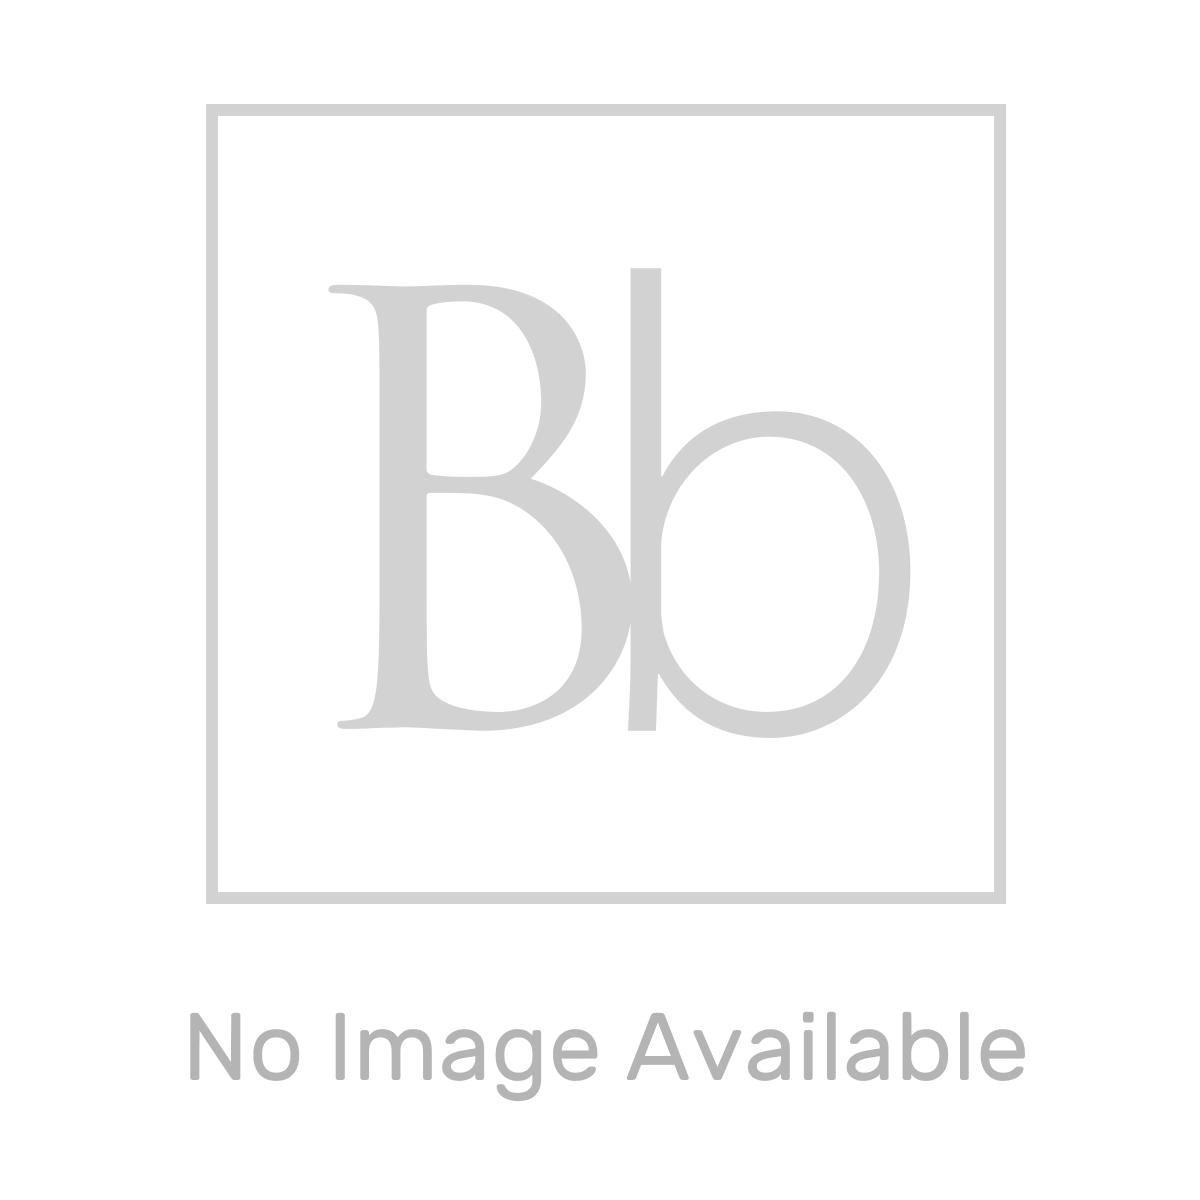 Kartell Astley Matt Grey Front Bath Panel 1800mm Lifestyle